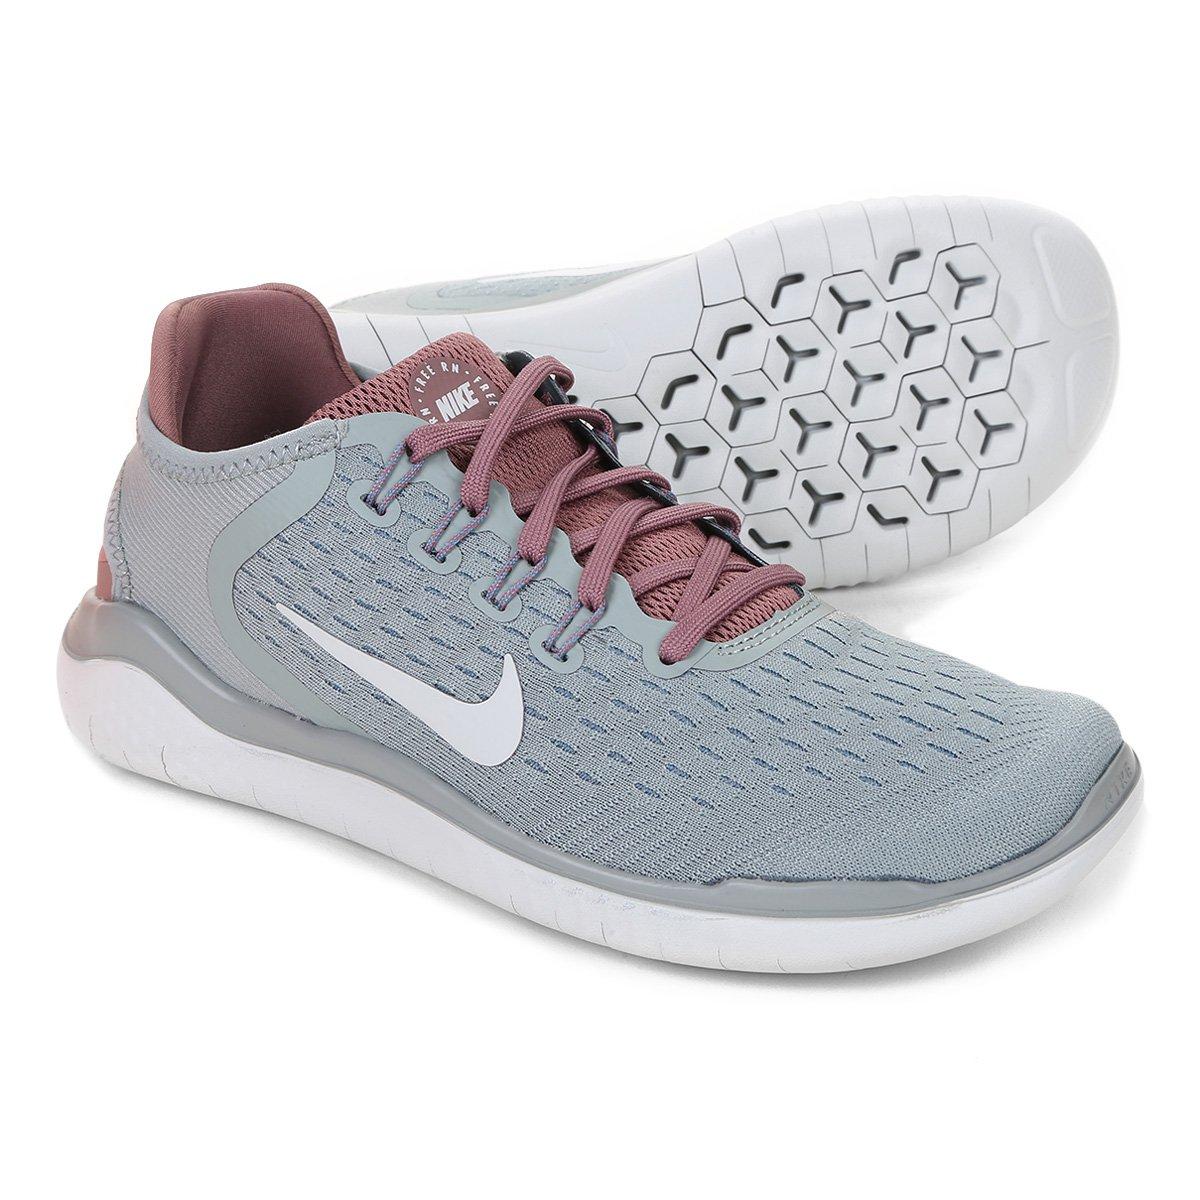 0545ee7c782 FornecedorNetshoes. Tênis Nike Free Rn 2018 Feminino